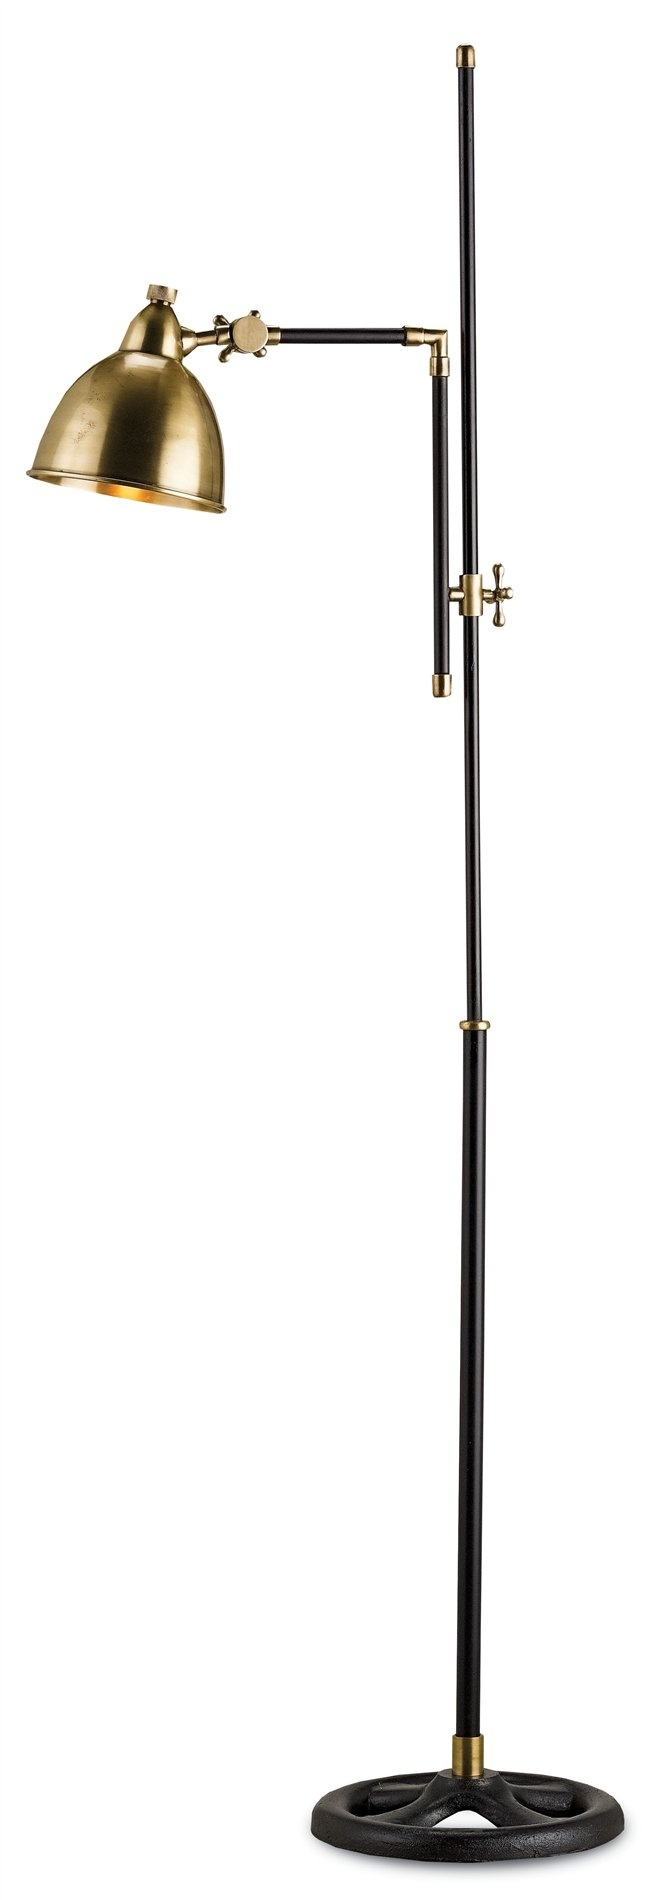 Currey and Company 8051 Drayton Traditional Floor Lamp CNC-8051